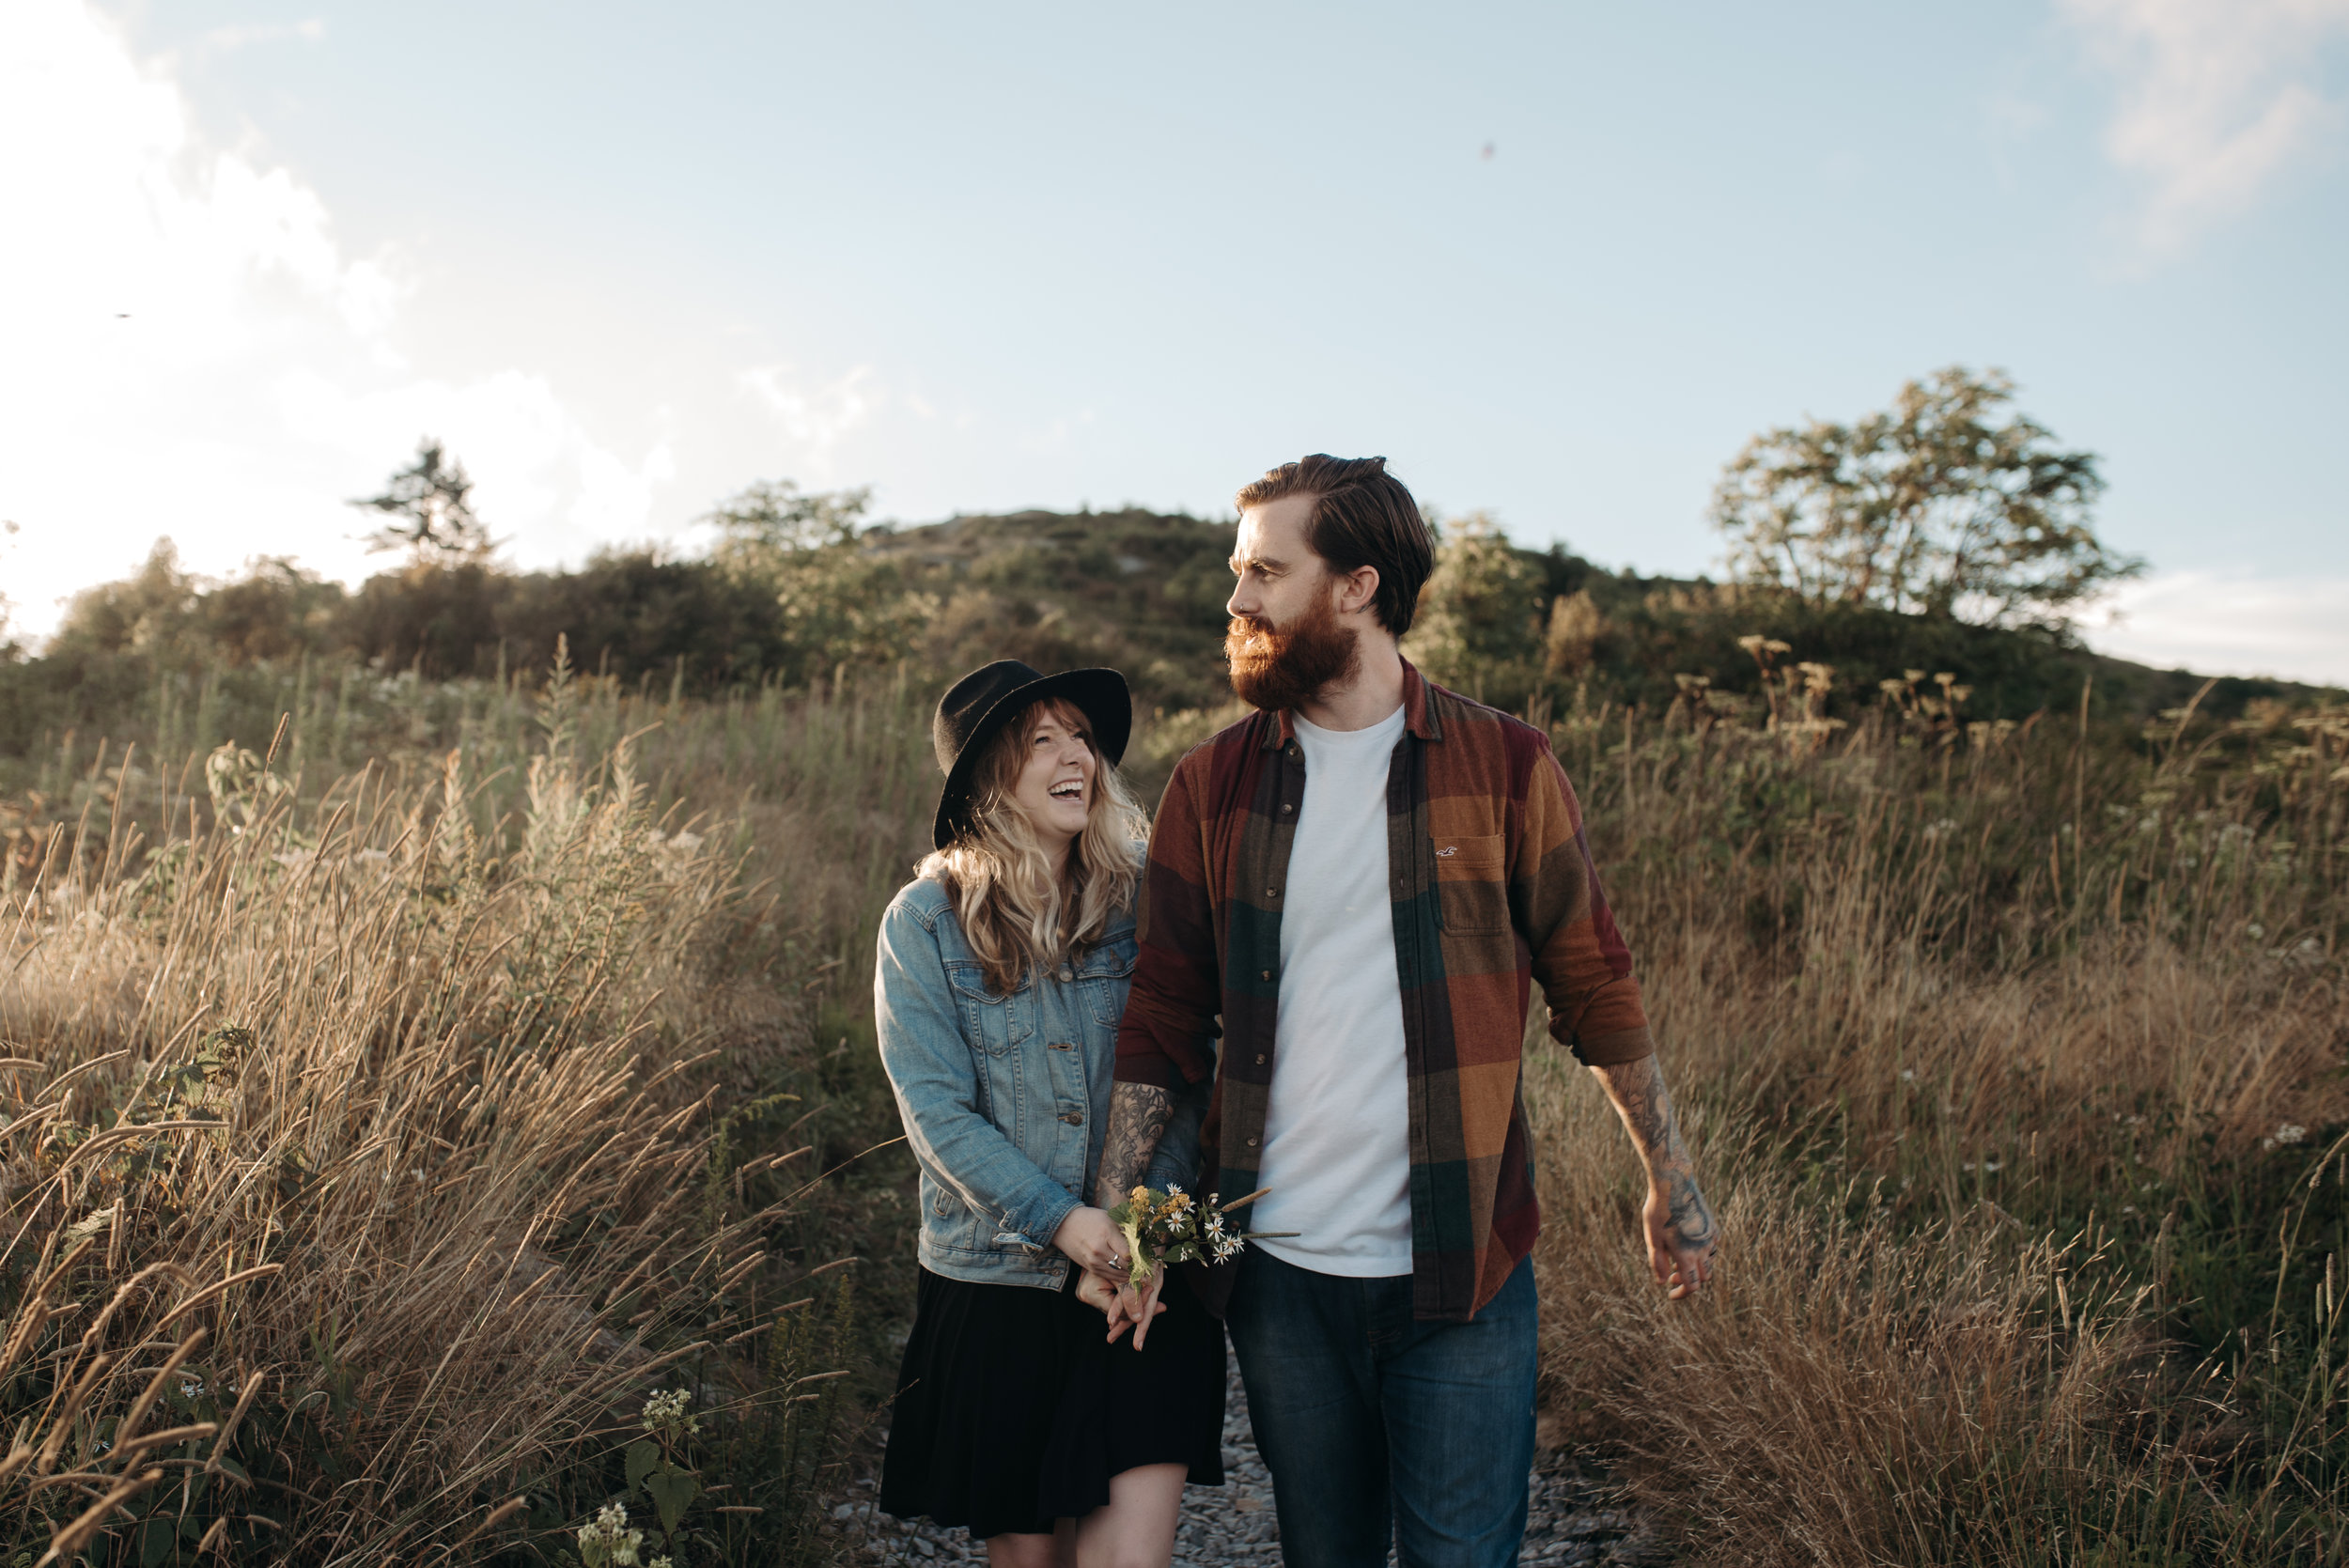 leah-joe-middleton-asheville-north-carolina-couple-session-destination-elopement-photographer-fox-and-film-81.jpg